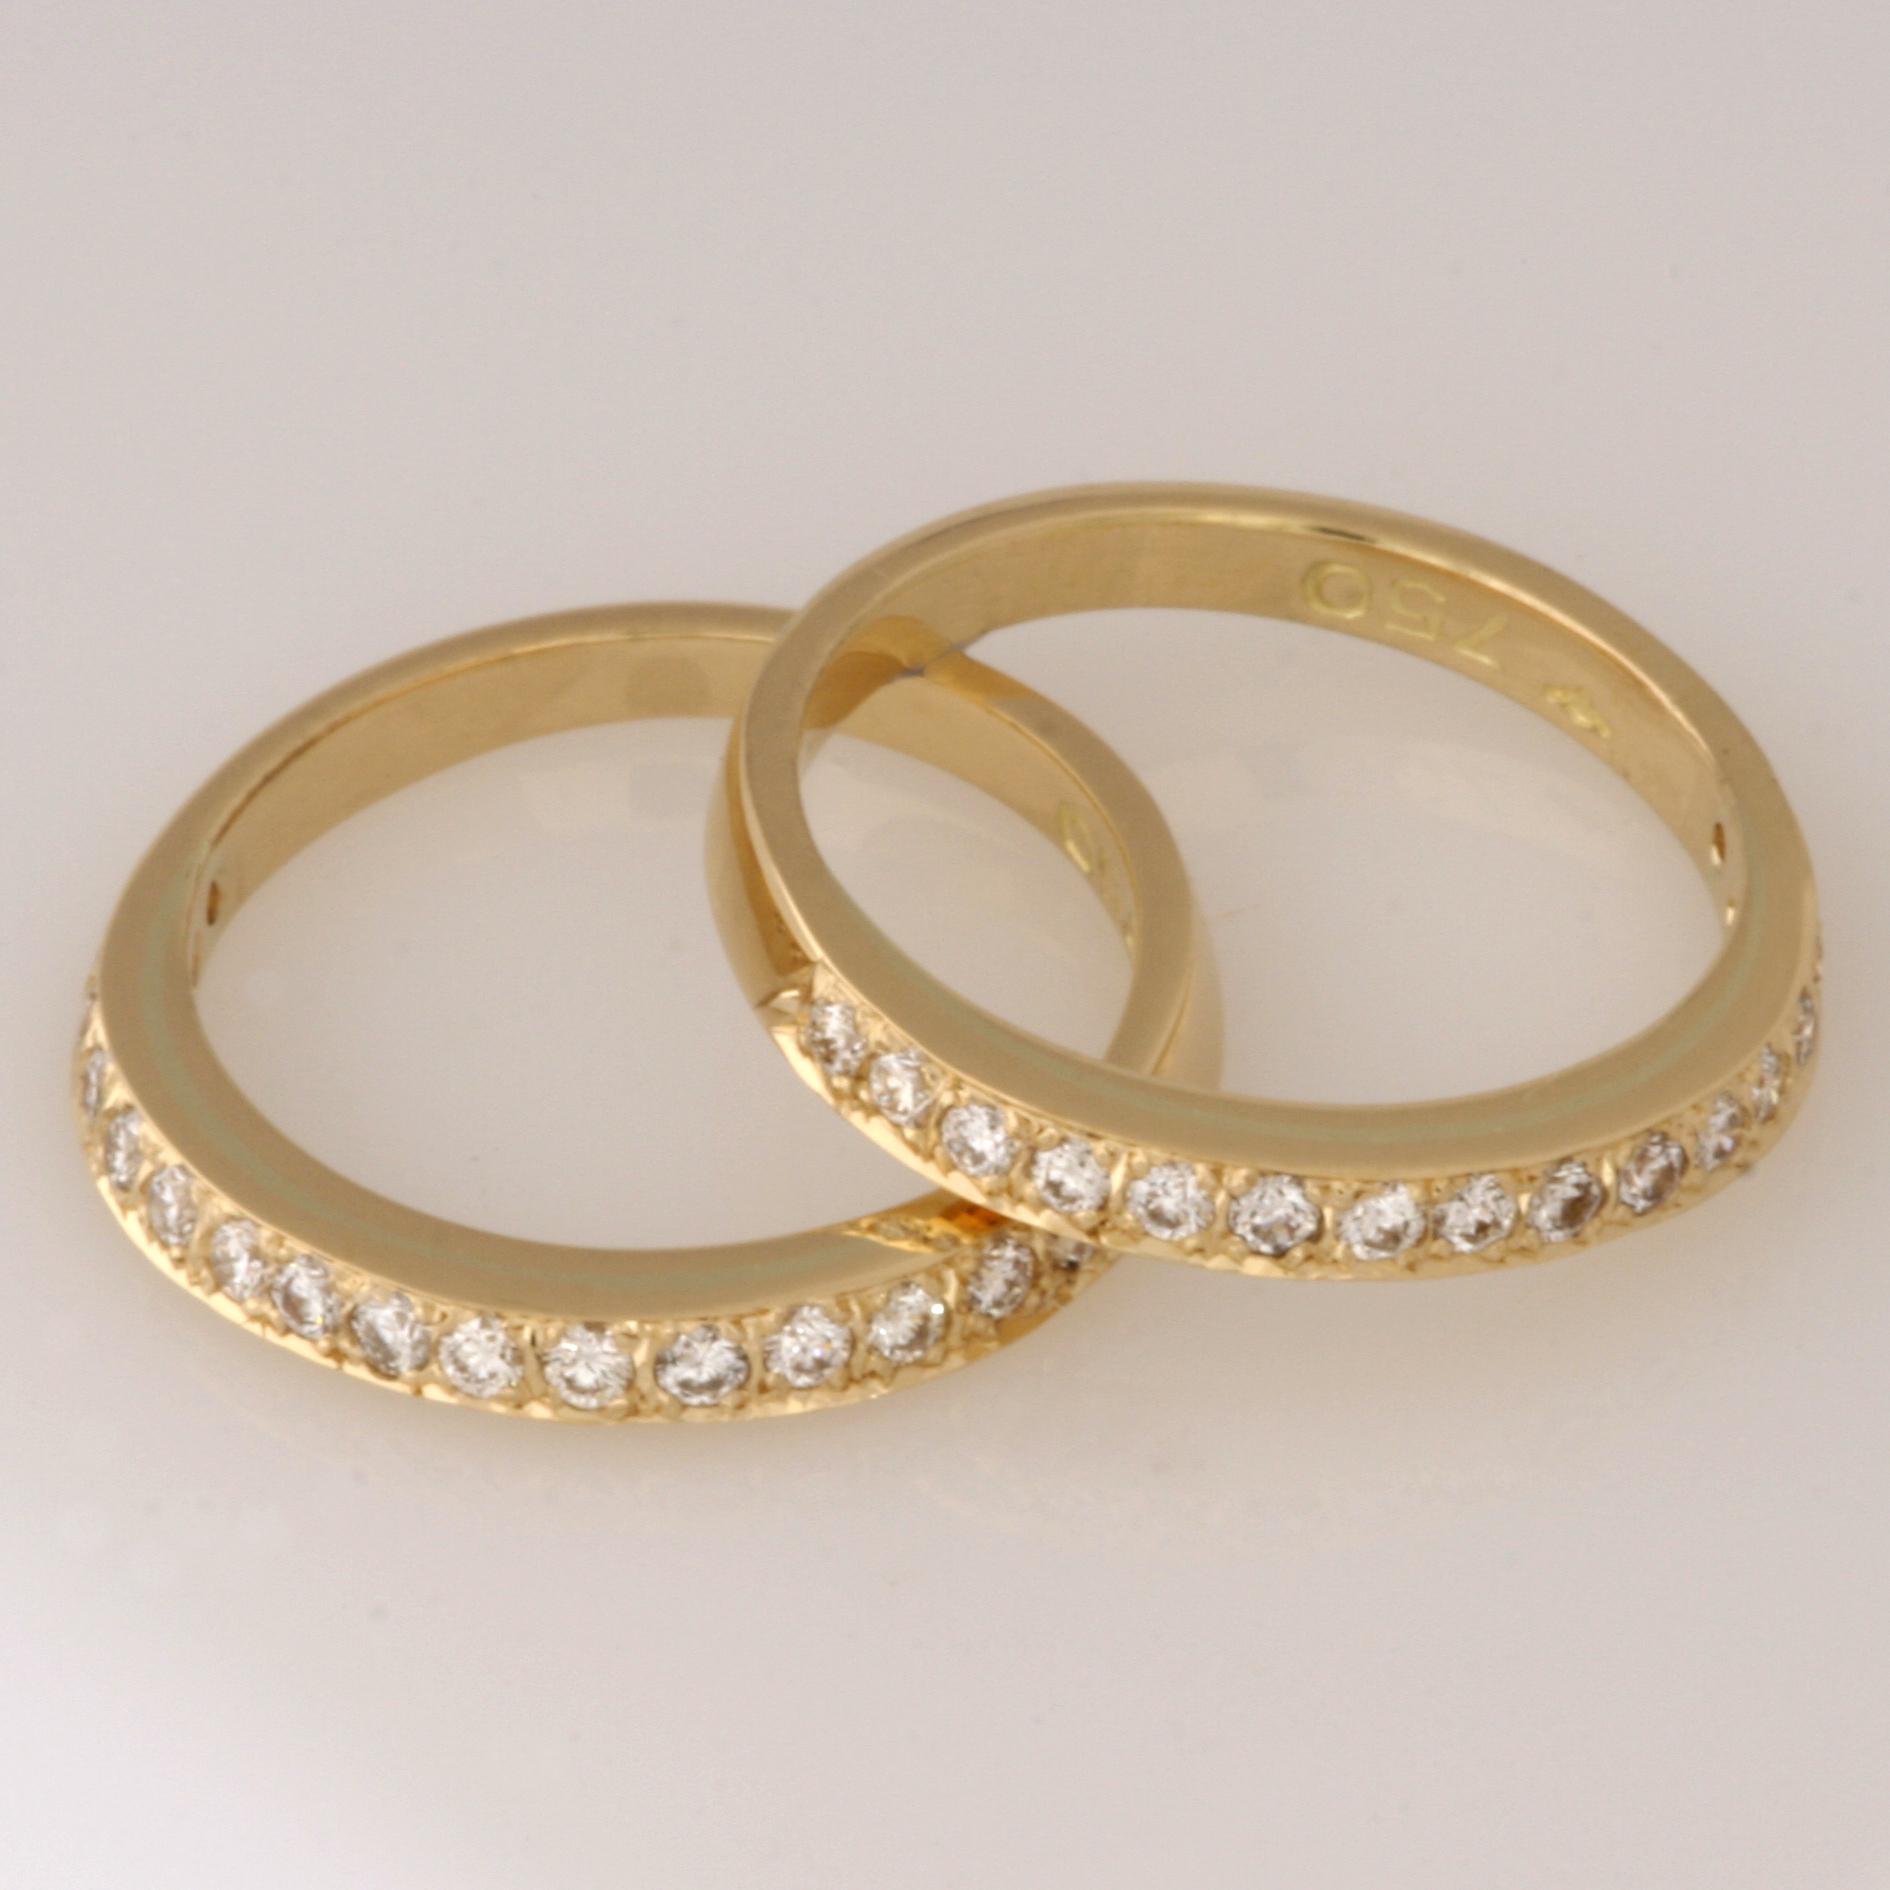 Handmade ladies 18ct yellow Gold diamond split wedding rings